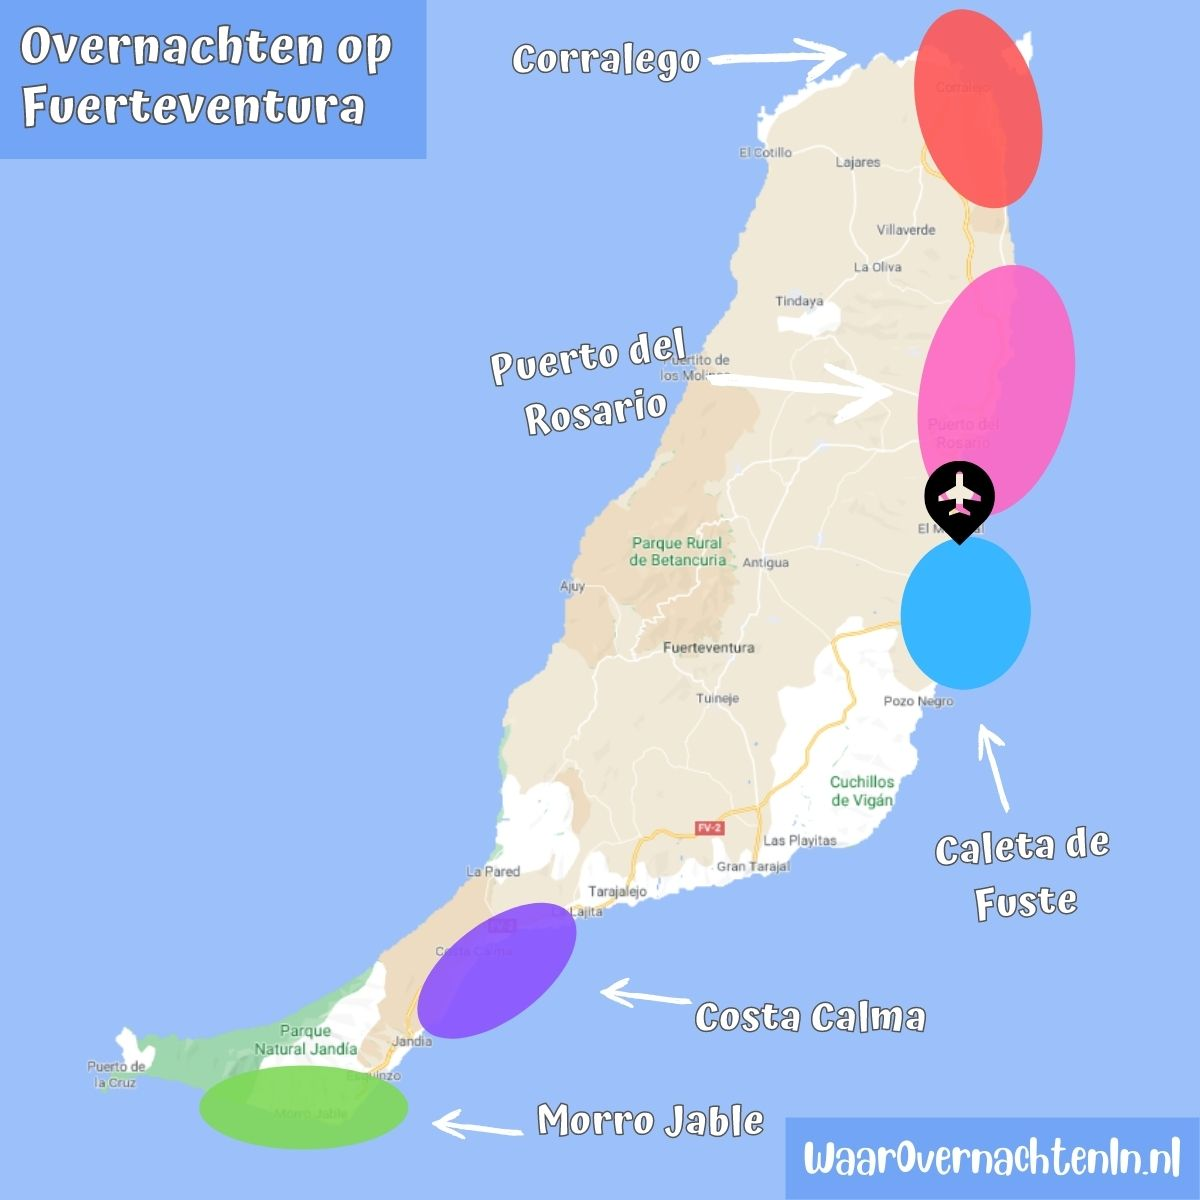 Leukste dorpjes Fuerteventura